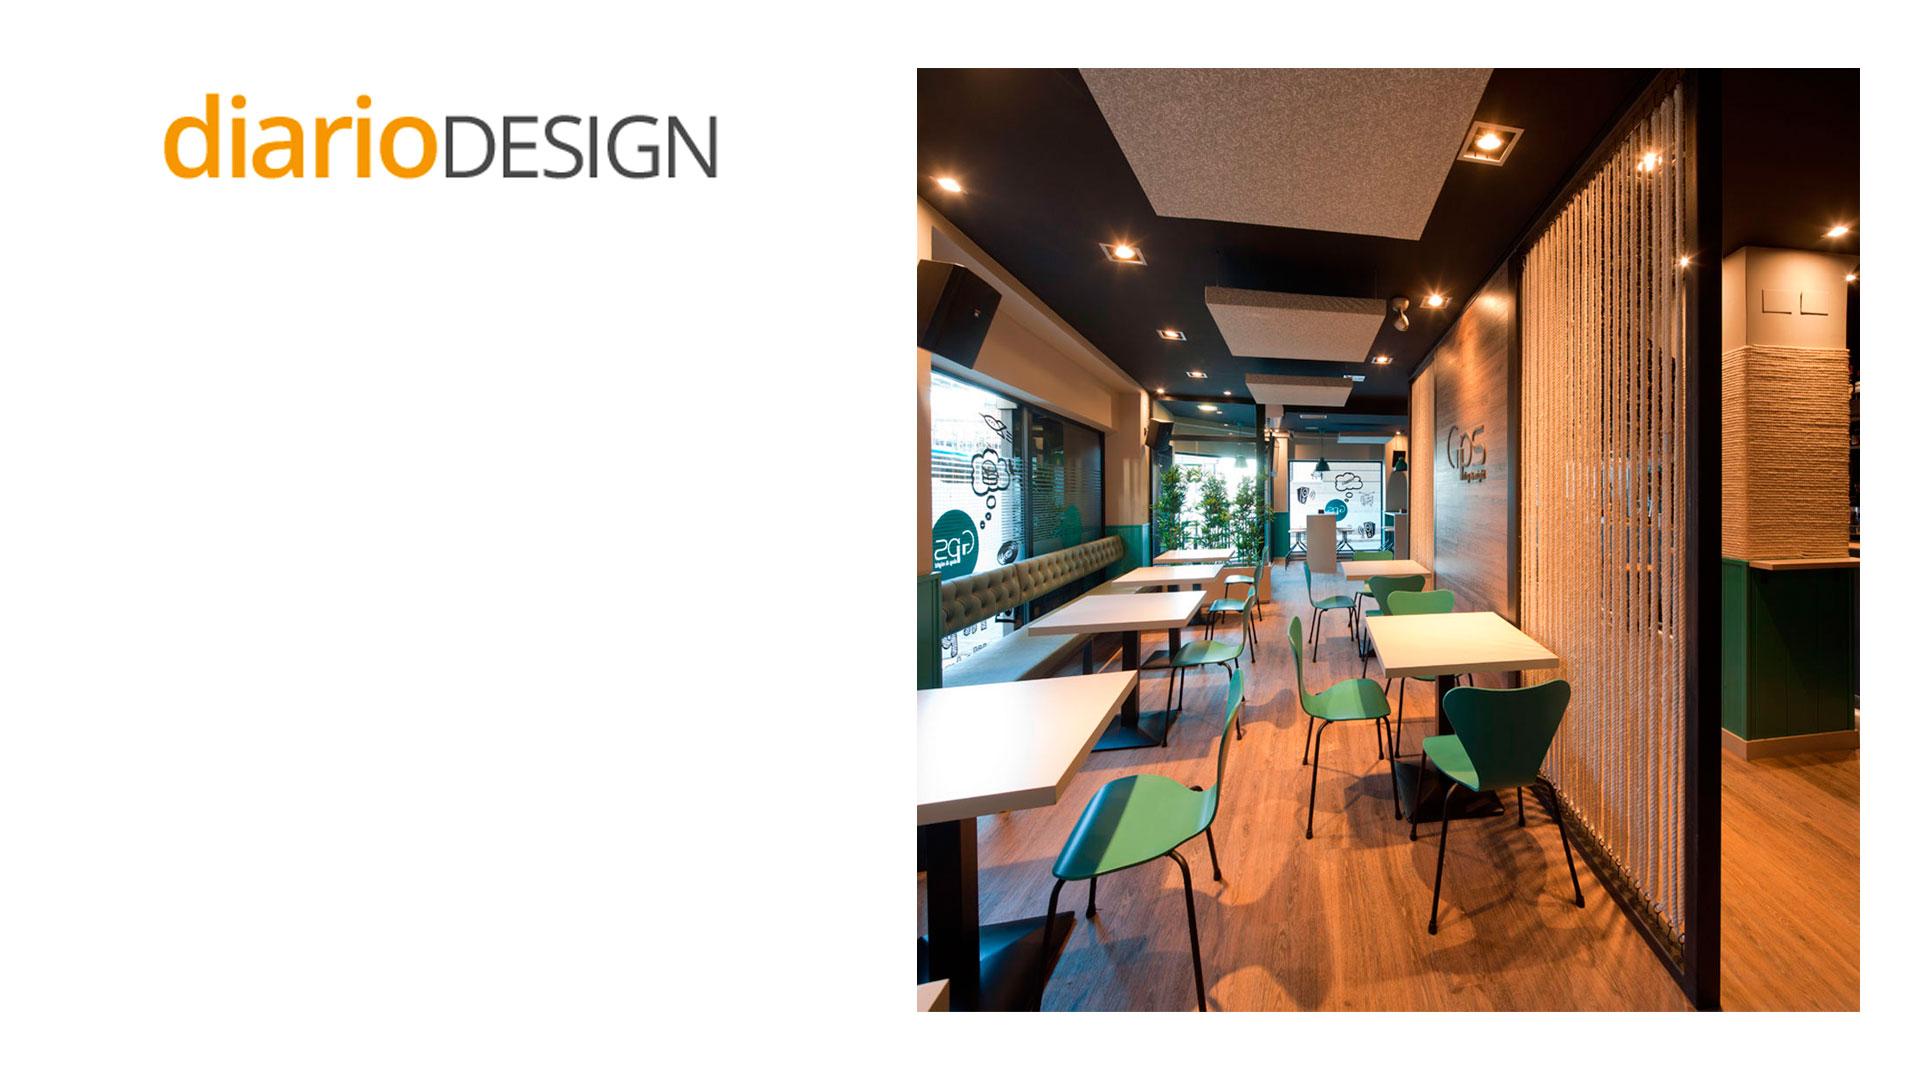 gps-day-night-diario-design